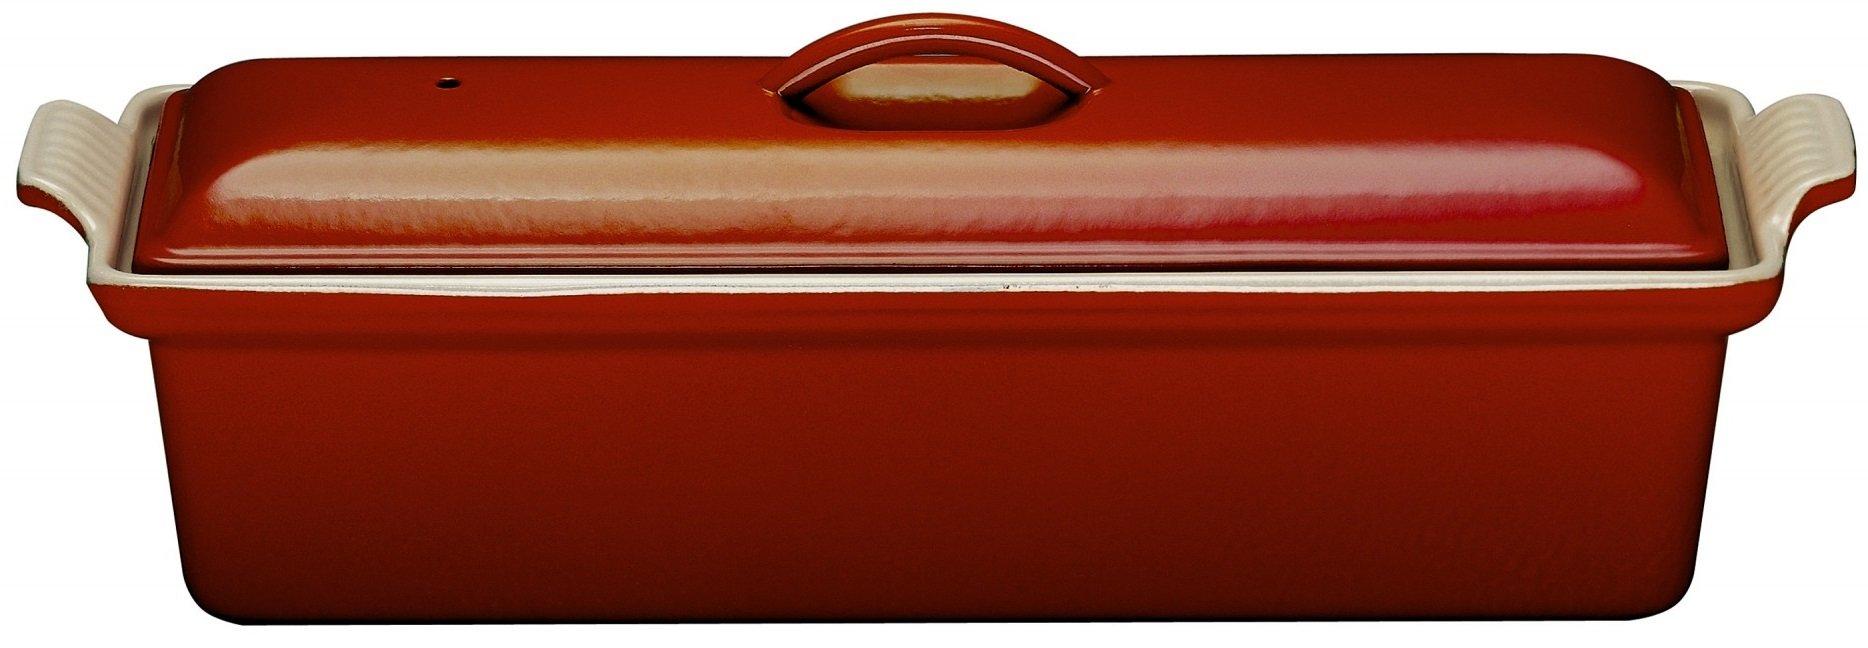 Le Creuset Enameled Cast-Iron 2 Quart Pate Terrine, Cerise (Cherry Red)